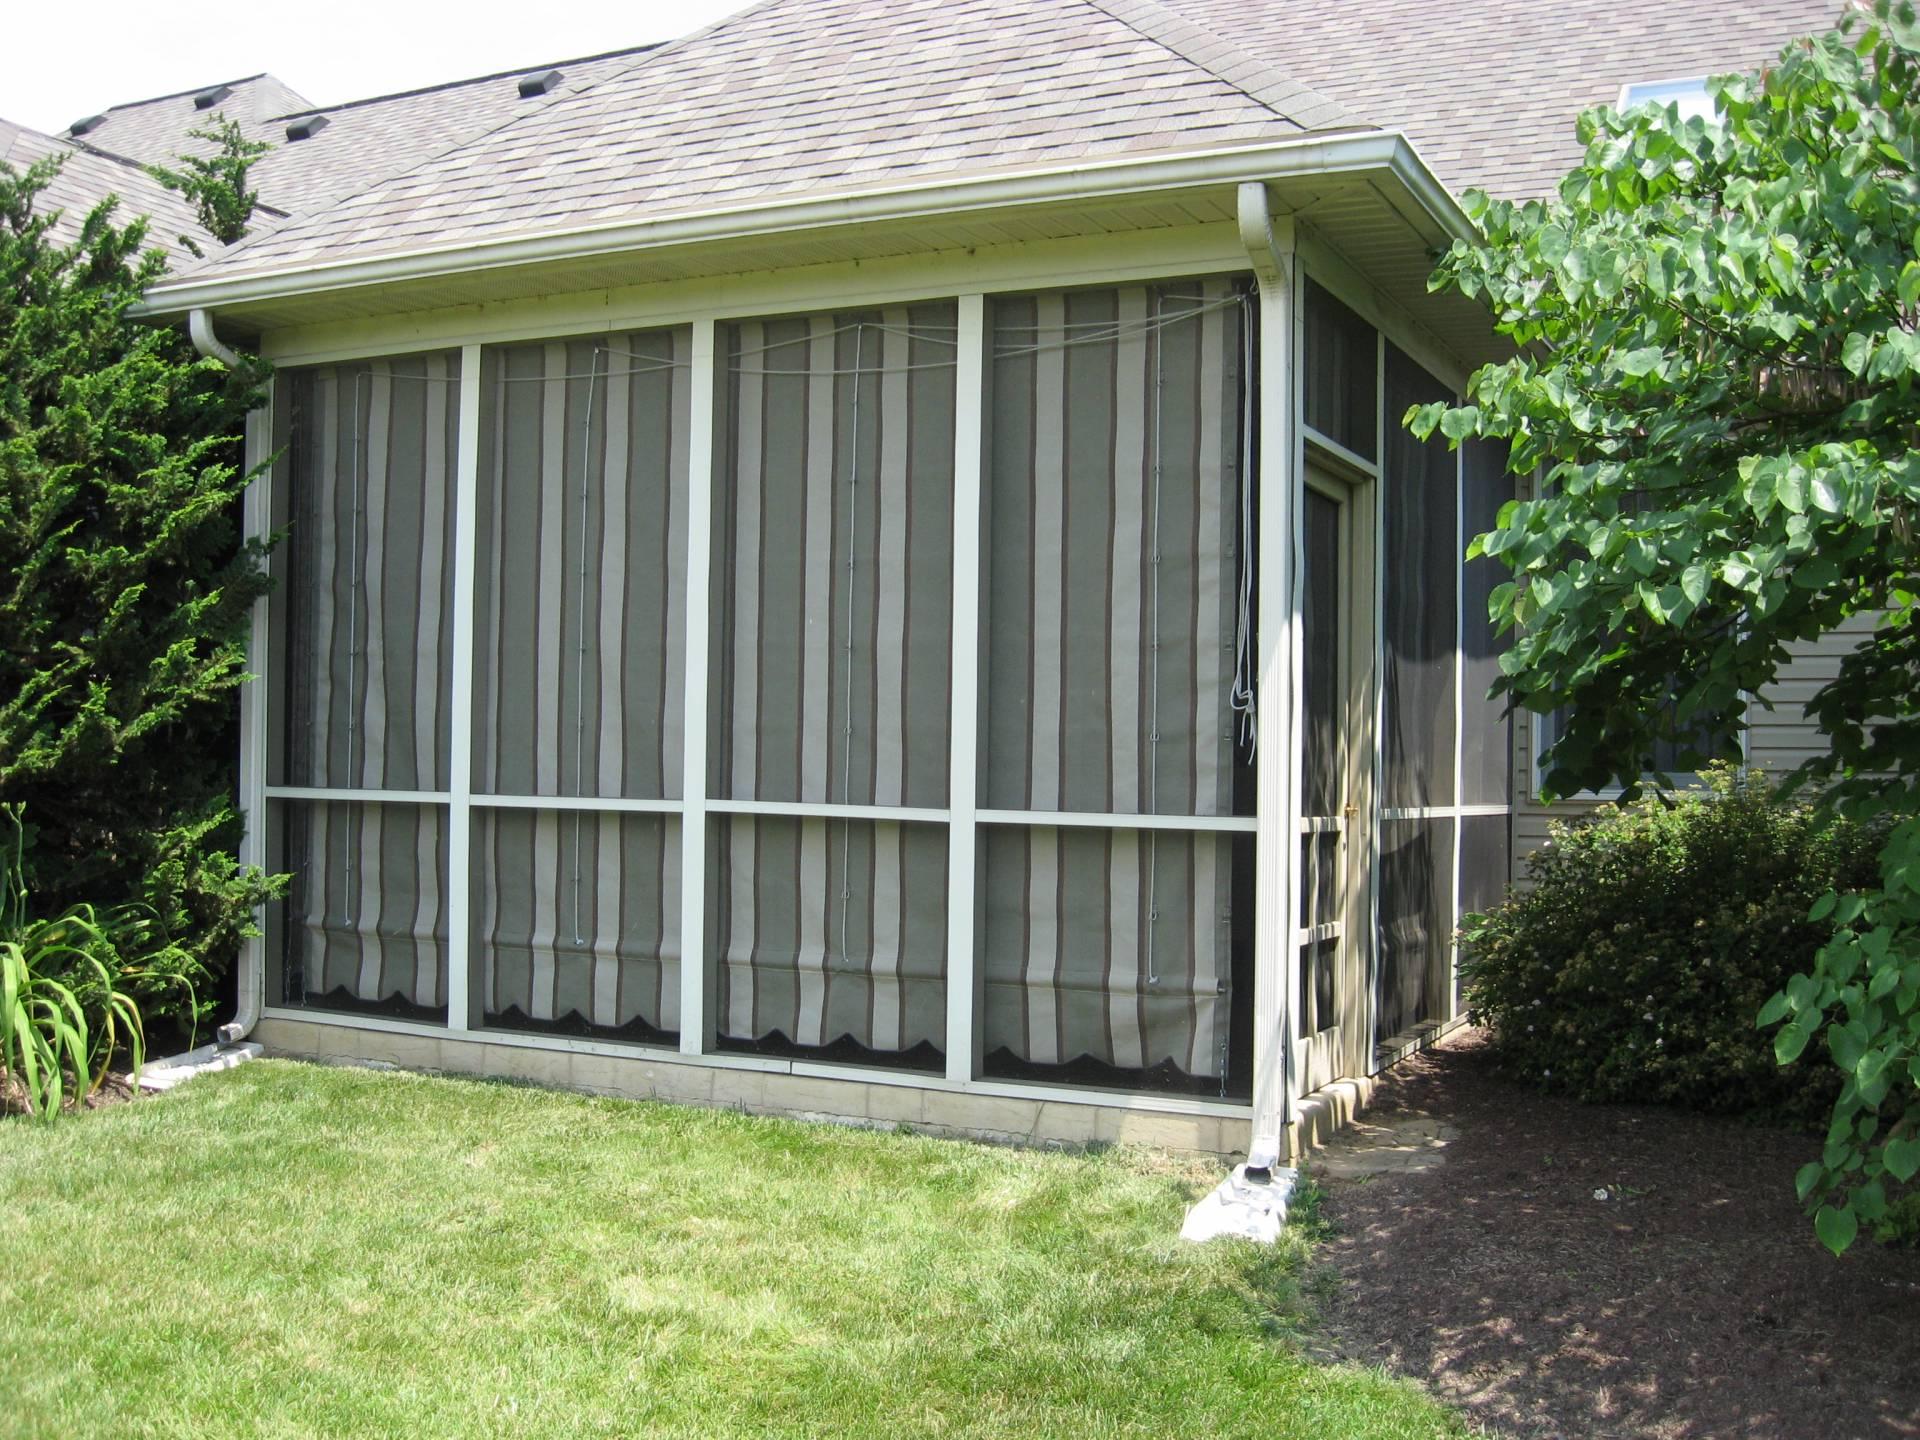 Sunbrella drop curtains for a screen porch kreider 39 s for Canvas privacy screen outdoor